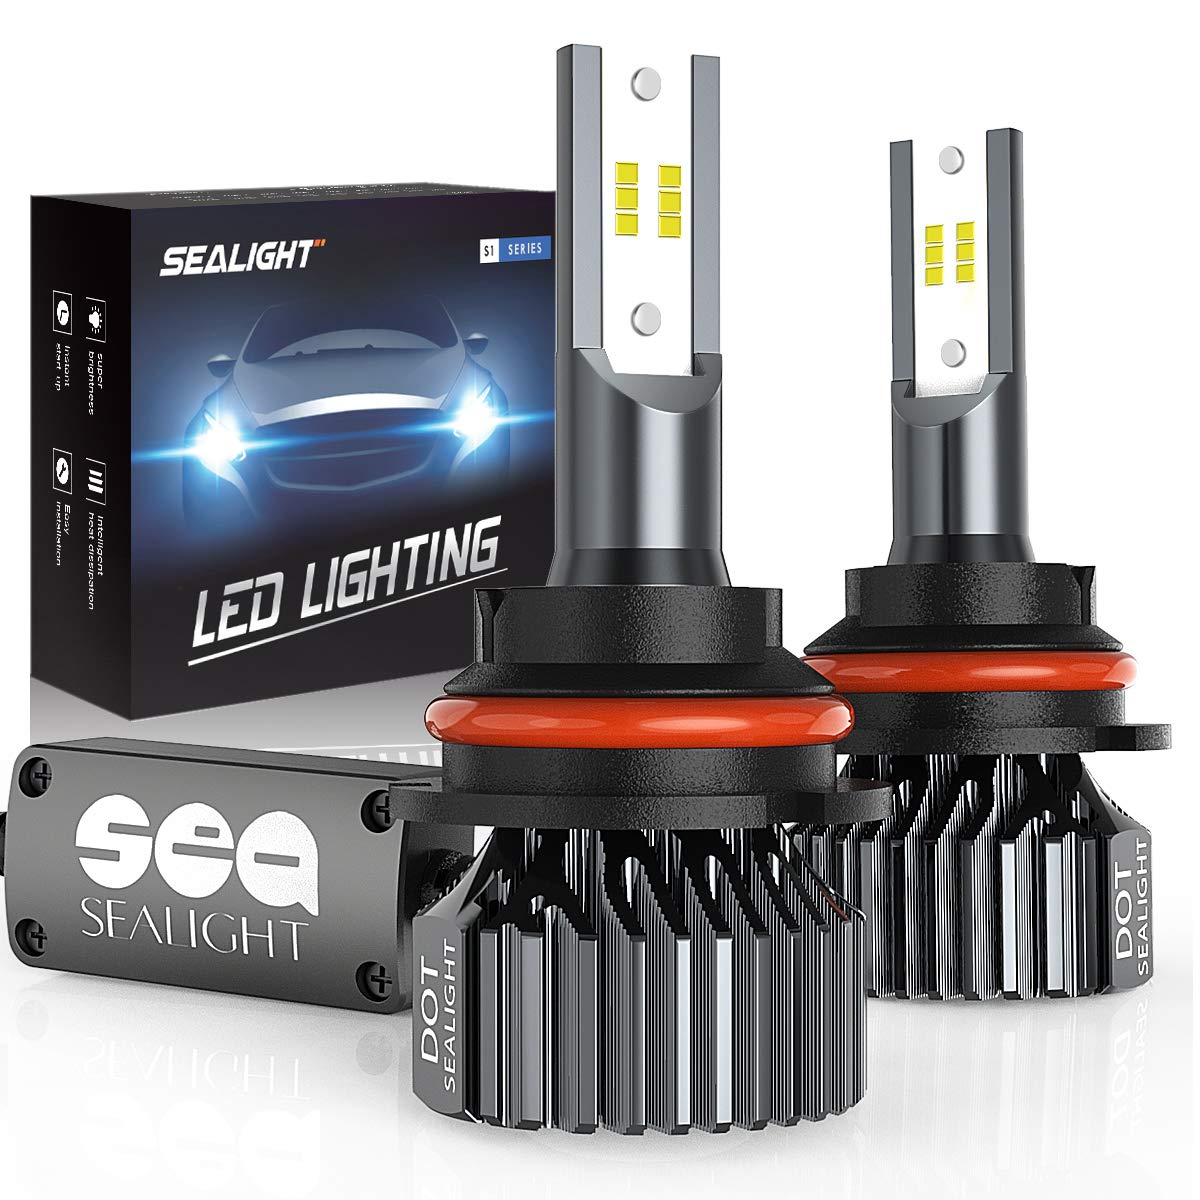 SEALIGHT 9007 HB5 led headlight bulbs Hi/Lo Beam,Smallest Size,Super Bright 12xCSP Chips Conversion Kit Dual beam Bulb 6000LM 6000K White(Pack of 2)